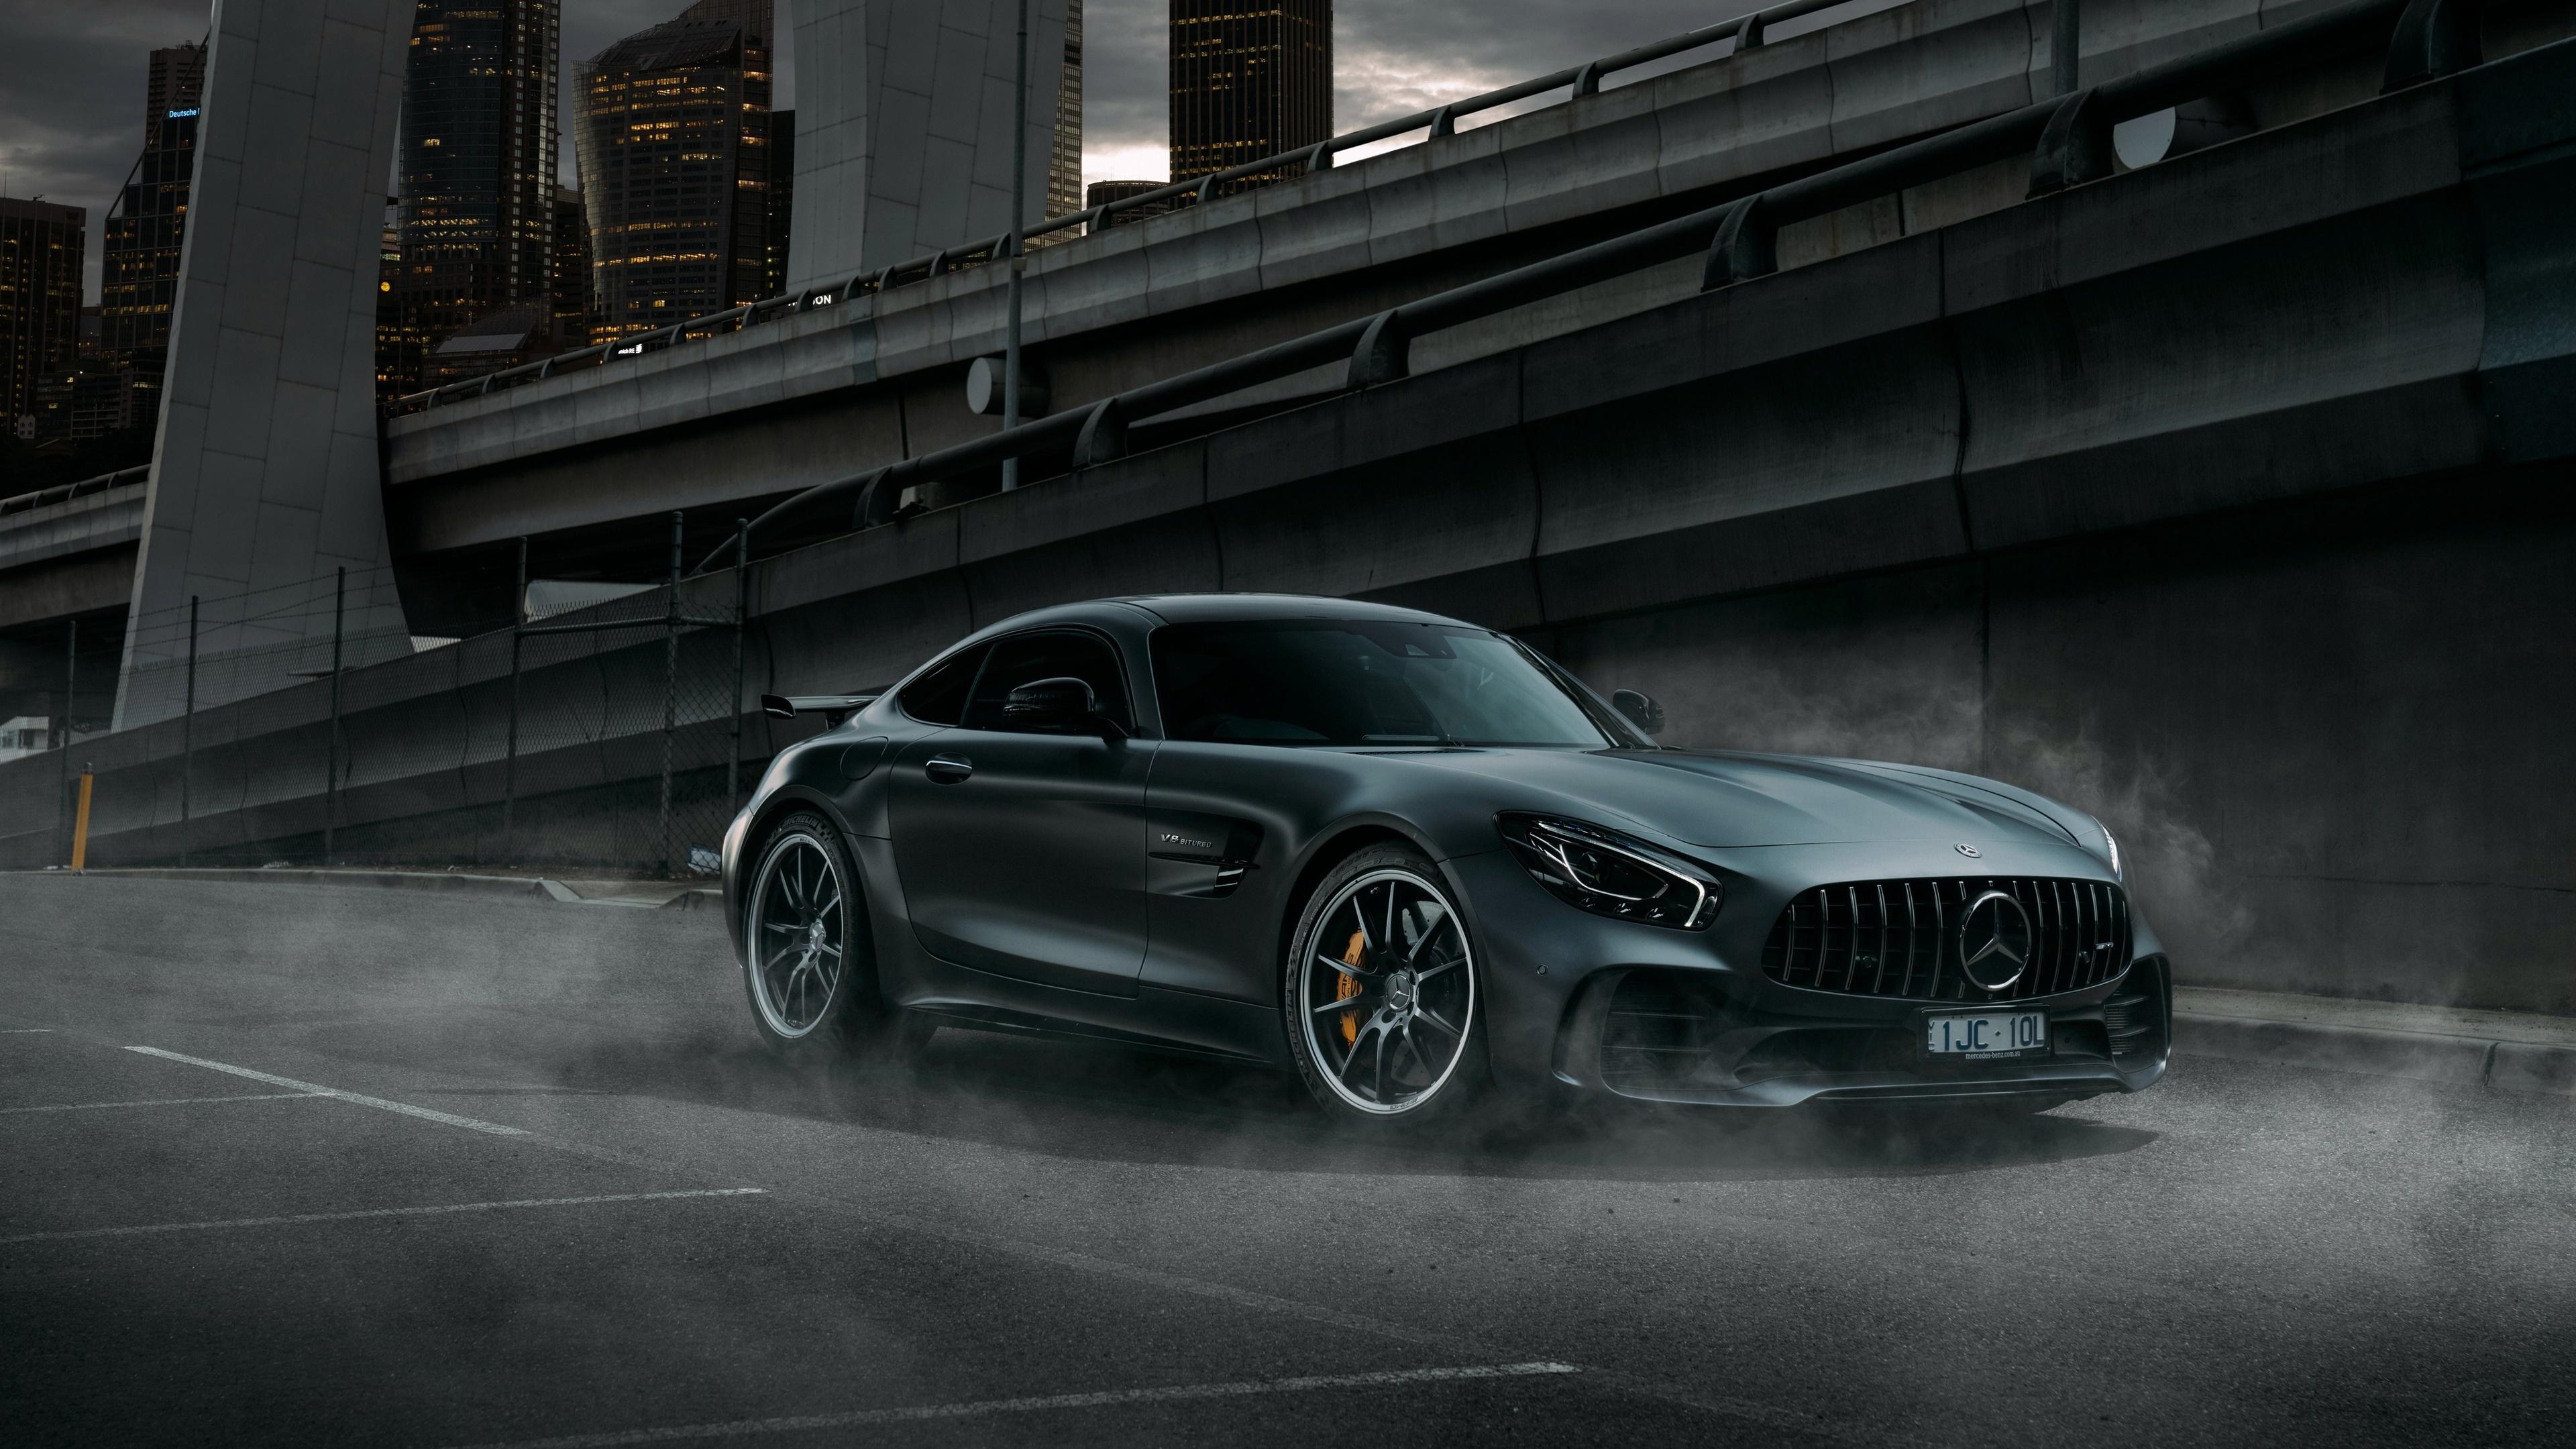 2018 mercedes benz gt r amg 1539109185 - 2018 Mercedes Benz GT R AMG - mercedes wallpapers, mercedes benz wallpapers, hd-wallpapers, amg wallpapers, 4k-wallpapers, 2018 cars wallpapers